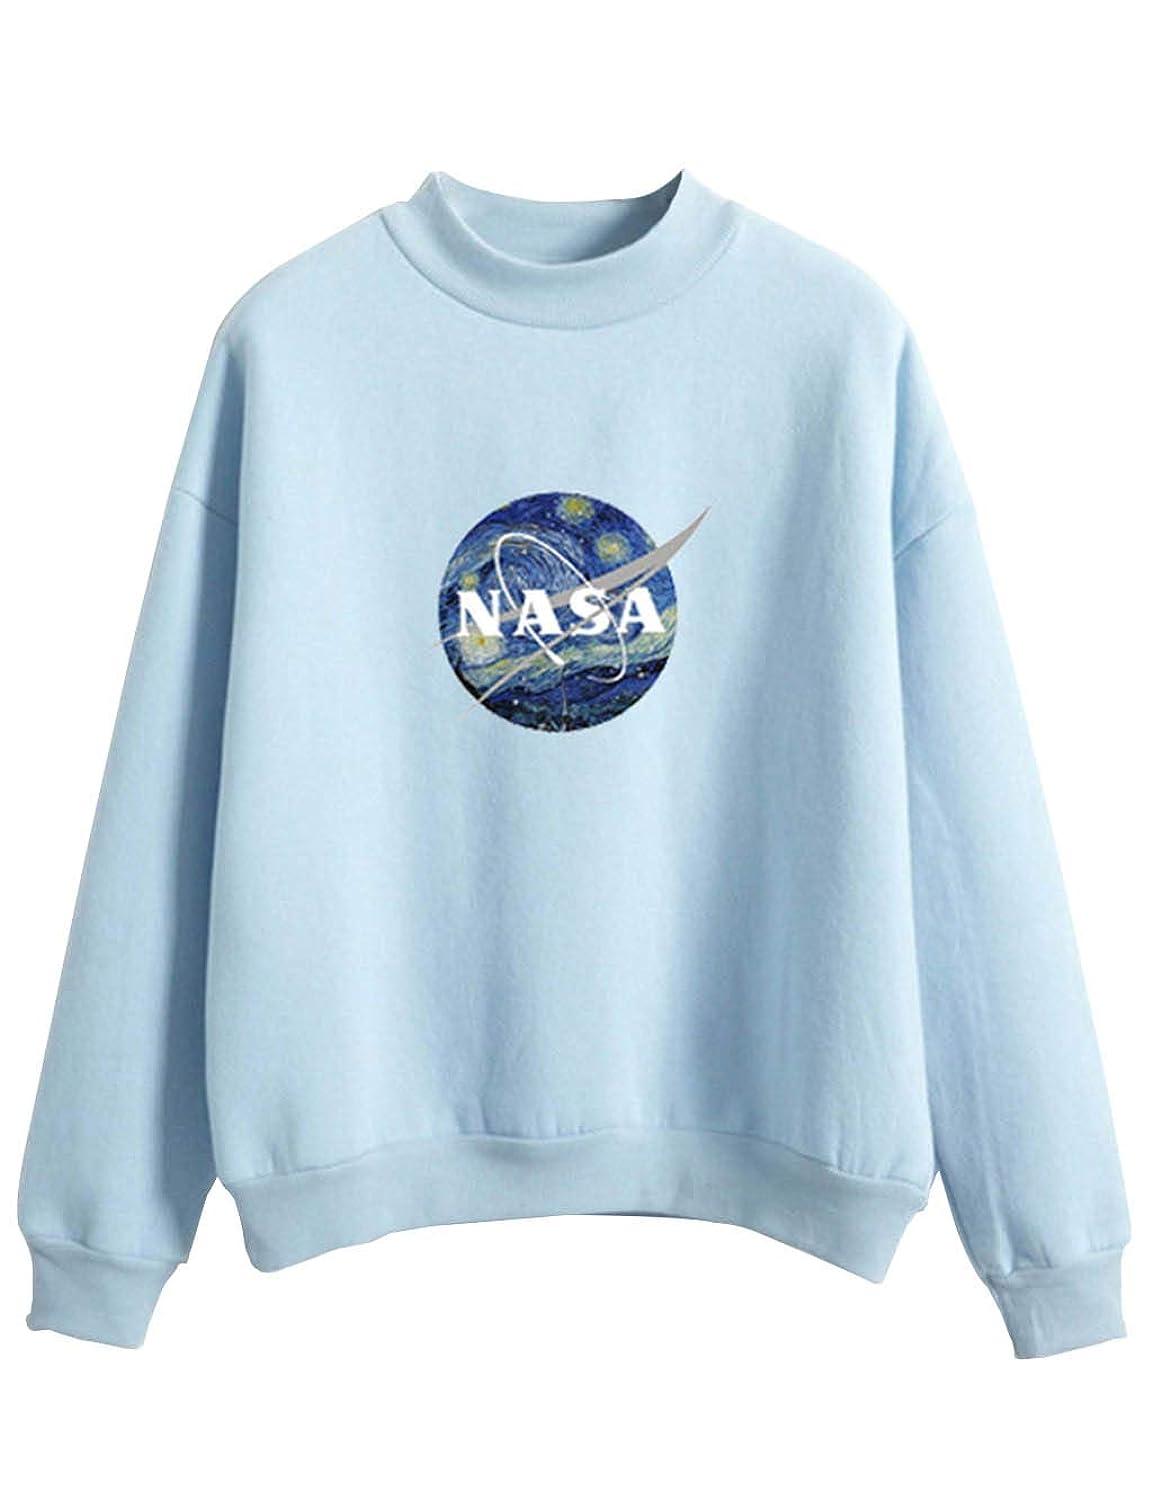 Teen Girl's Cute NASA Sweatshirts Pullover Clearance Solid Color Long Sleeve Jumper Sweater Jacket